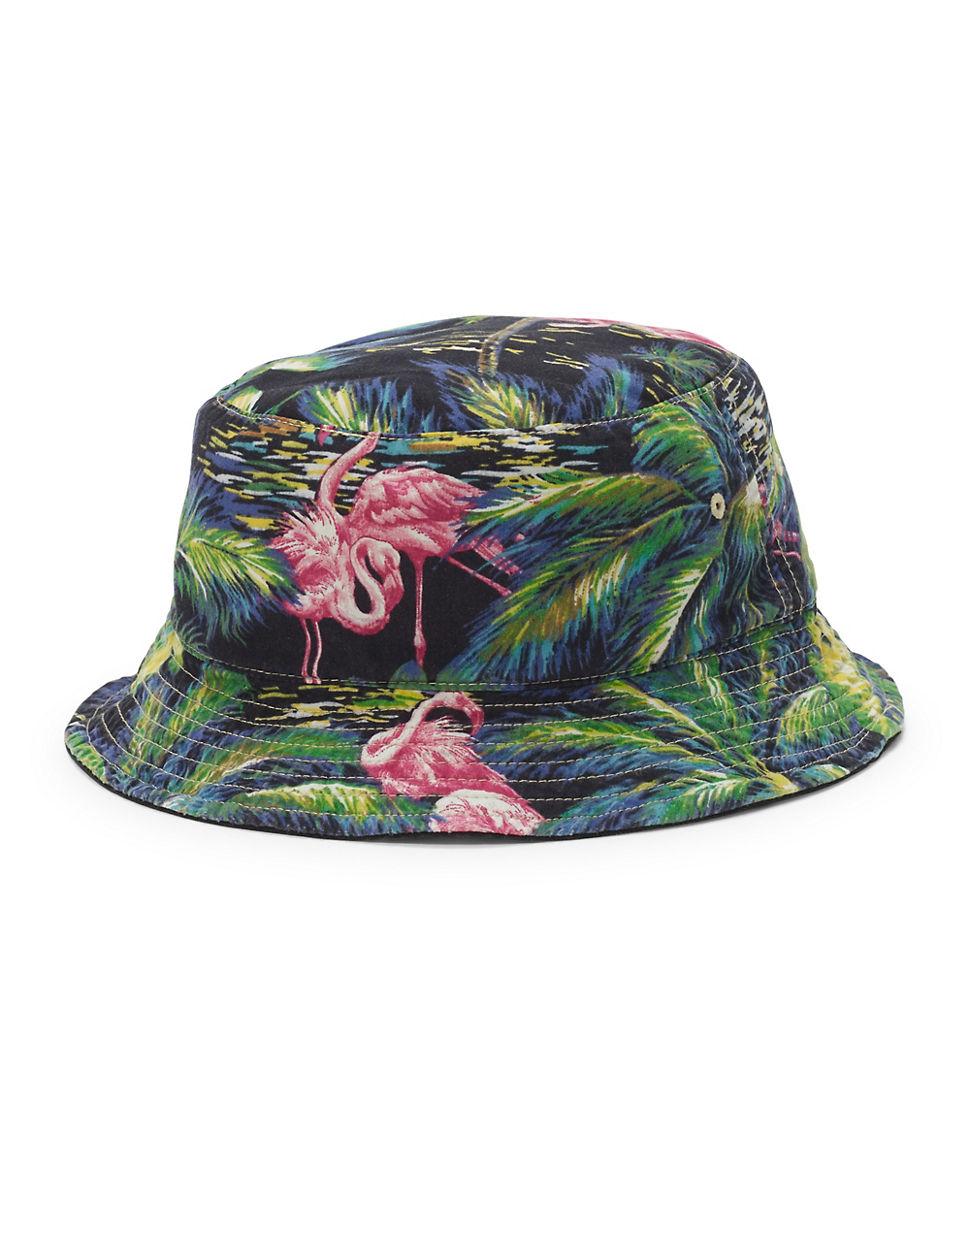 025a0f318c086 Polo Ralph Lauren Flamingo-print Reversible Bucket Hat in Black - Lyst